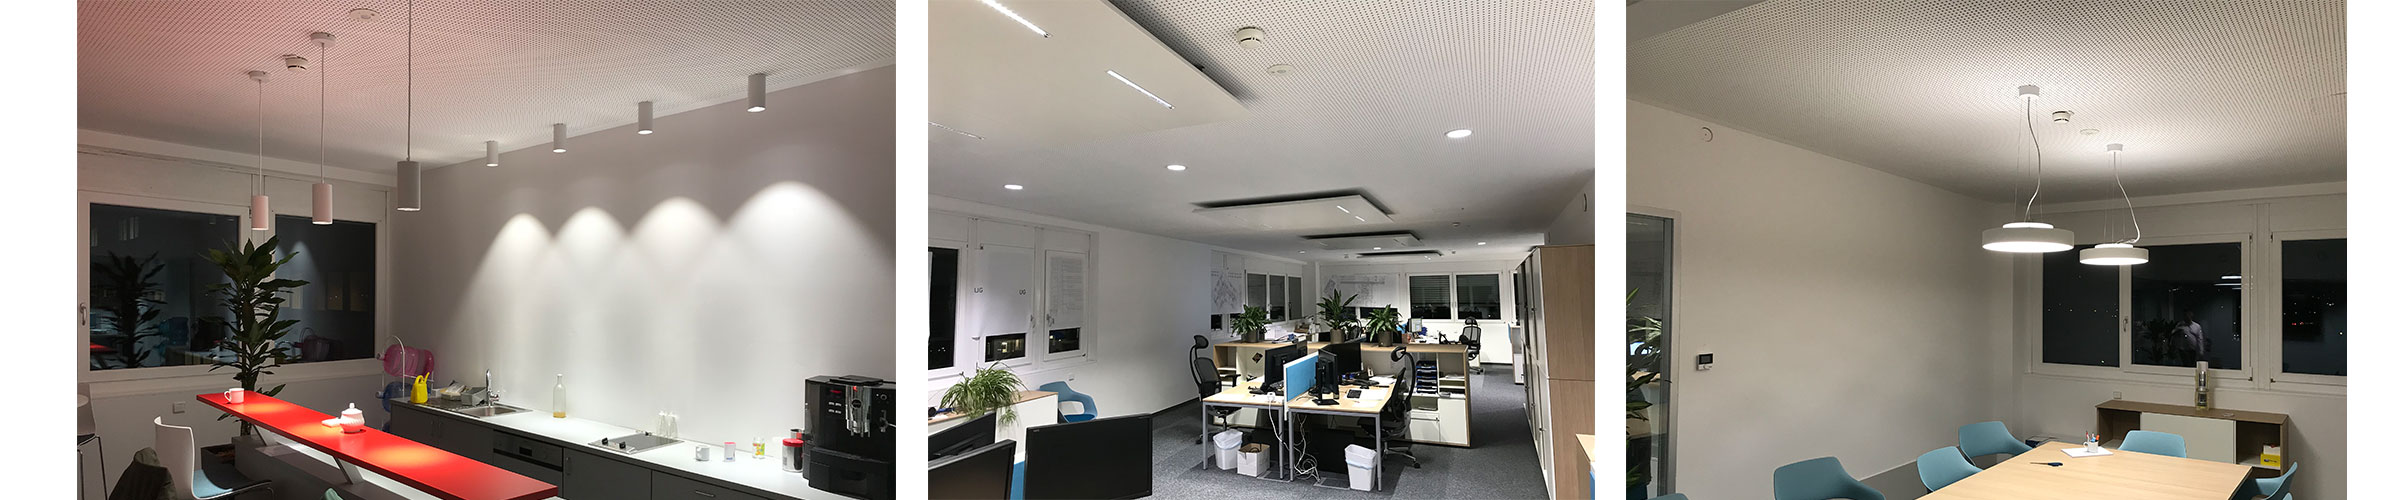 Bürobeleuchtung mit SML LED Produkten